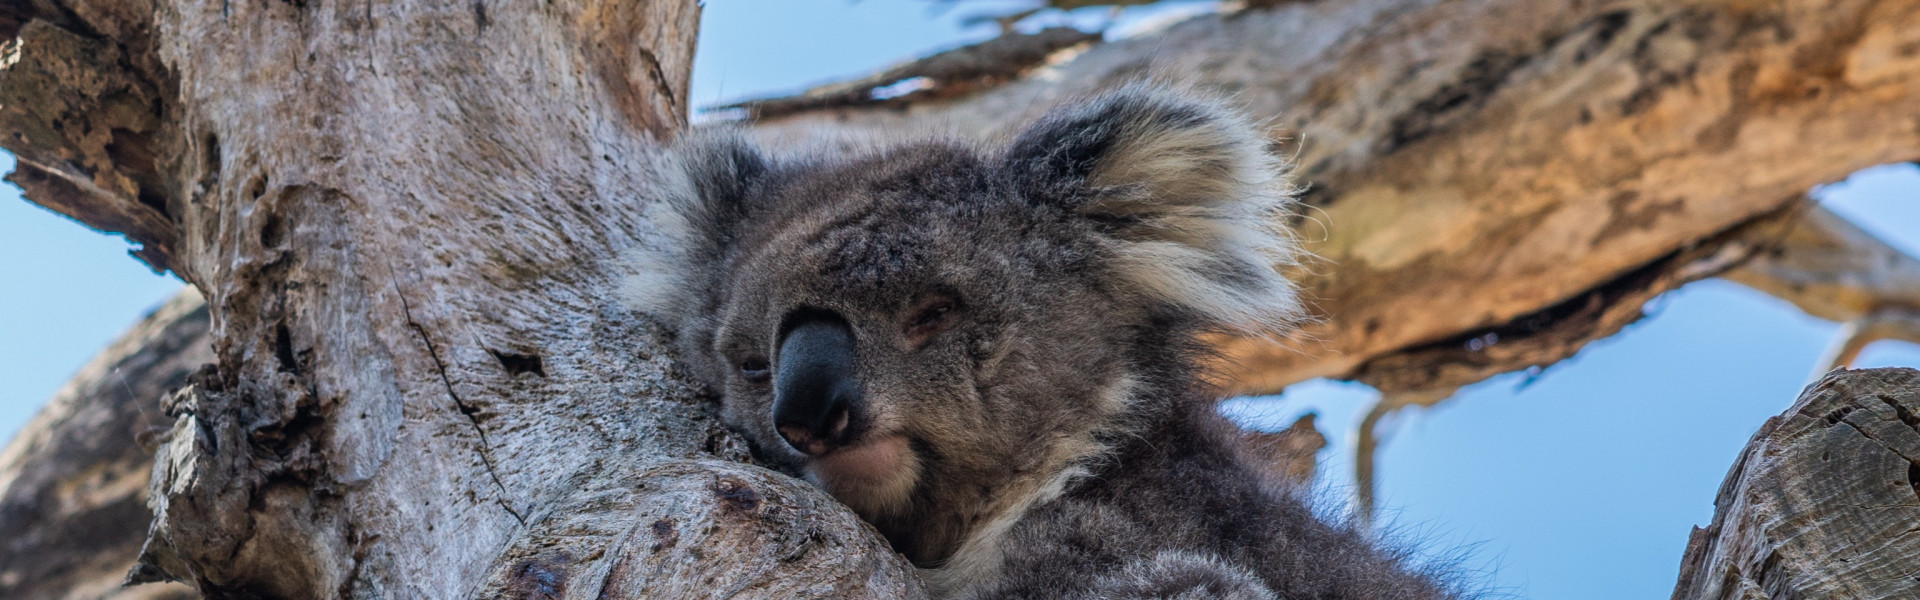 Main image ofL'australie, un rêve lointain